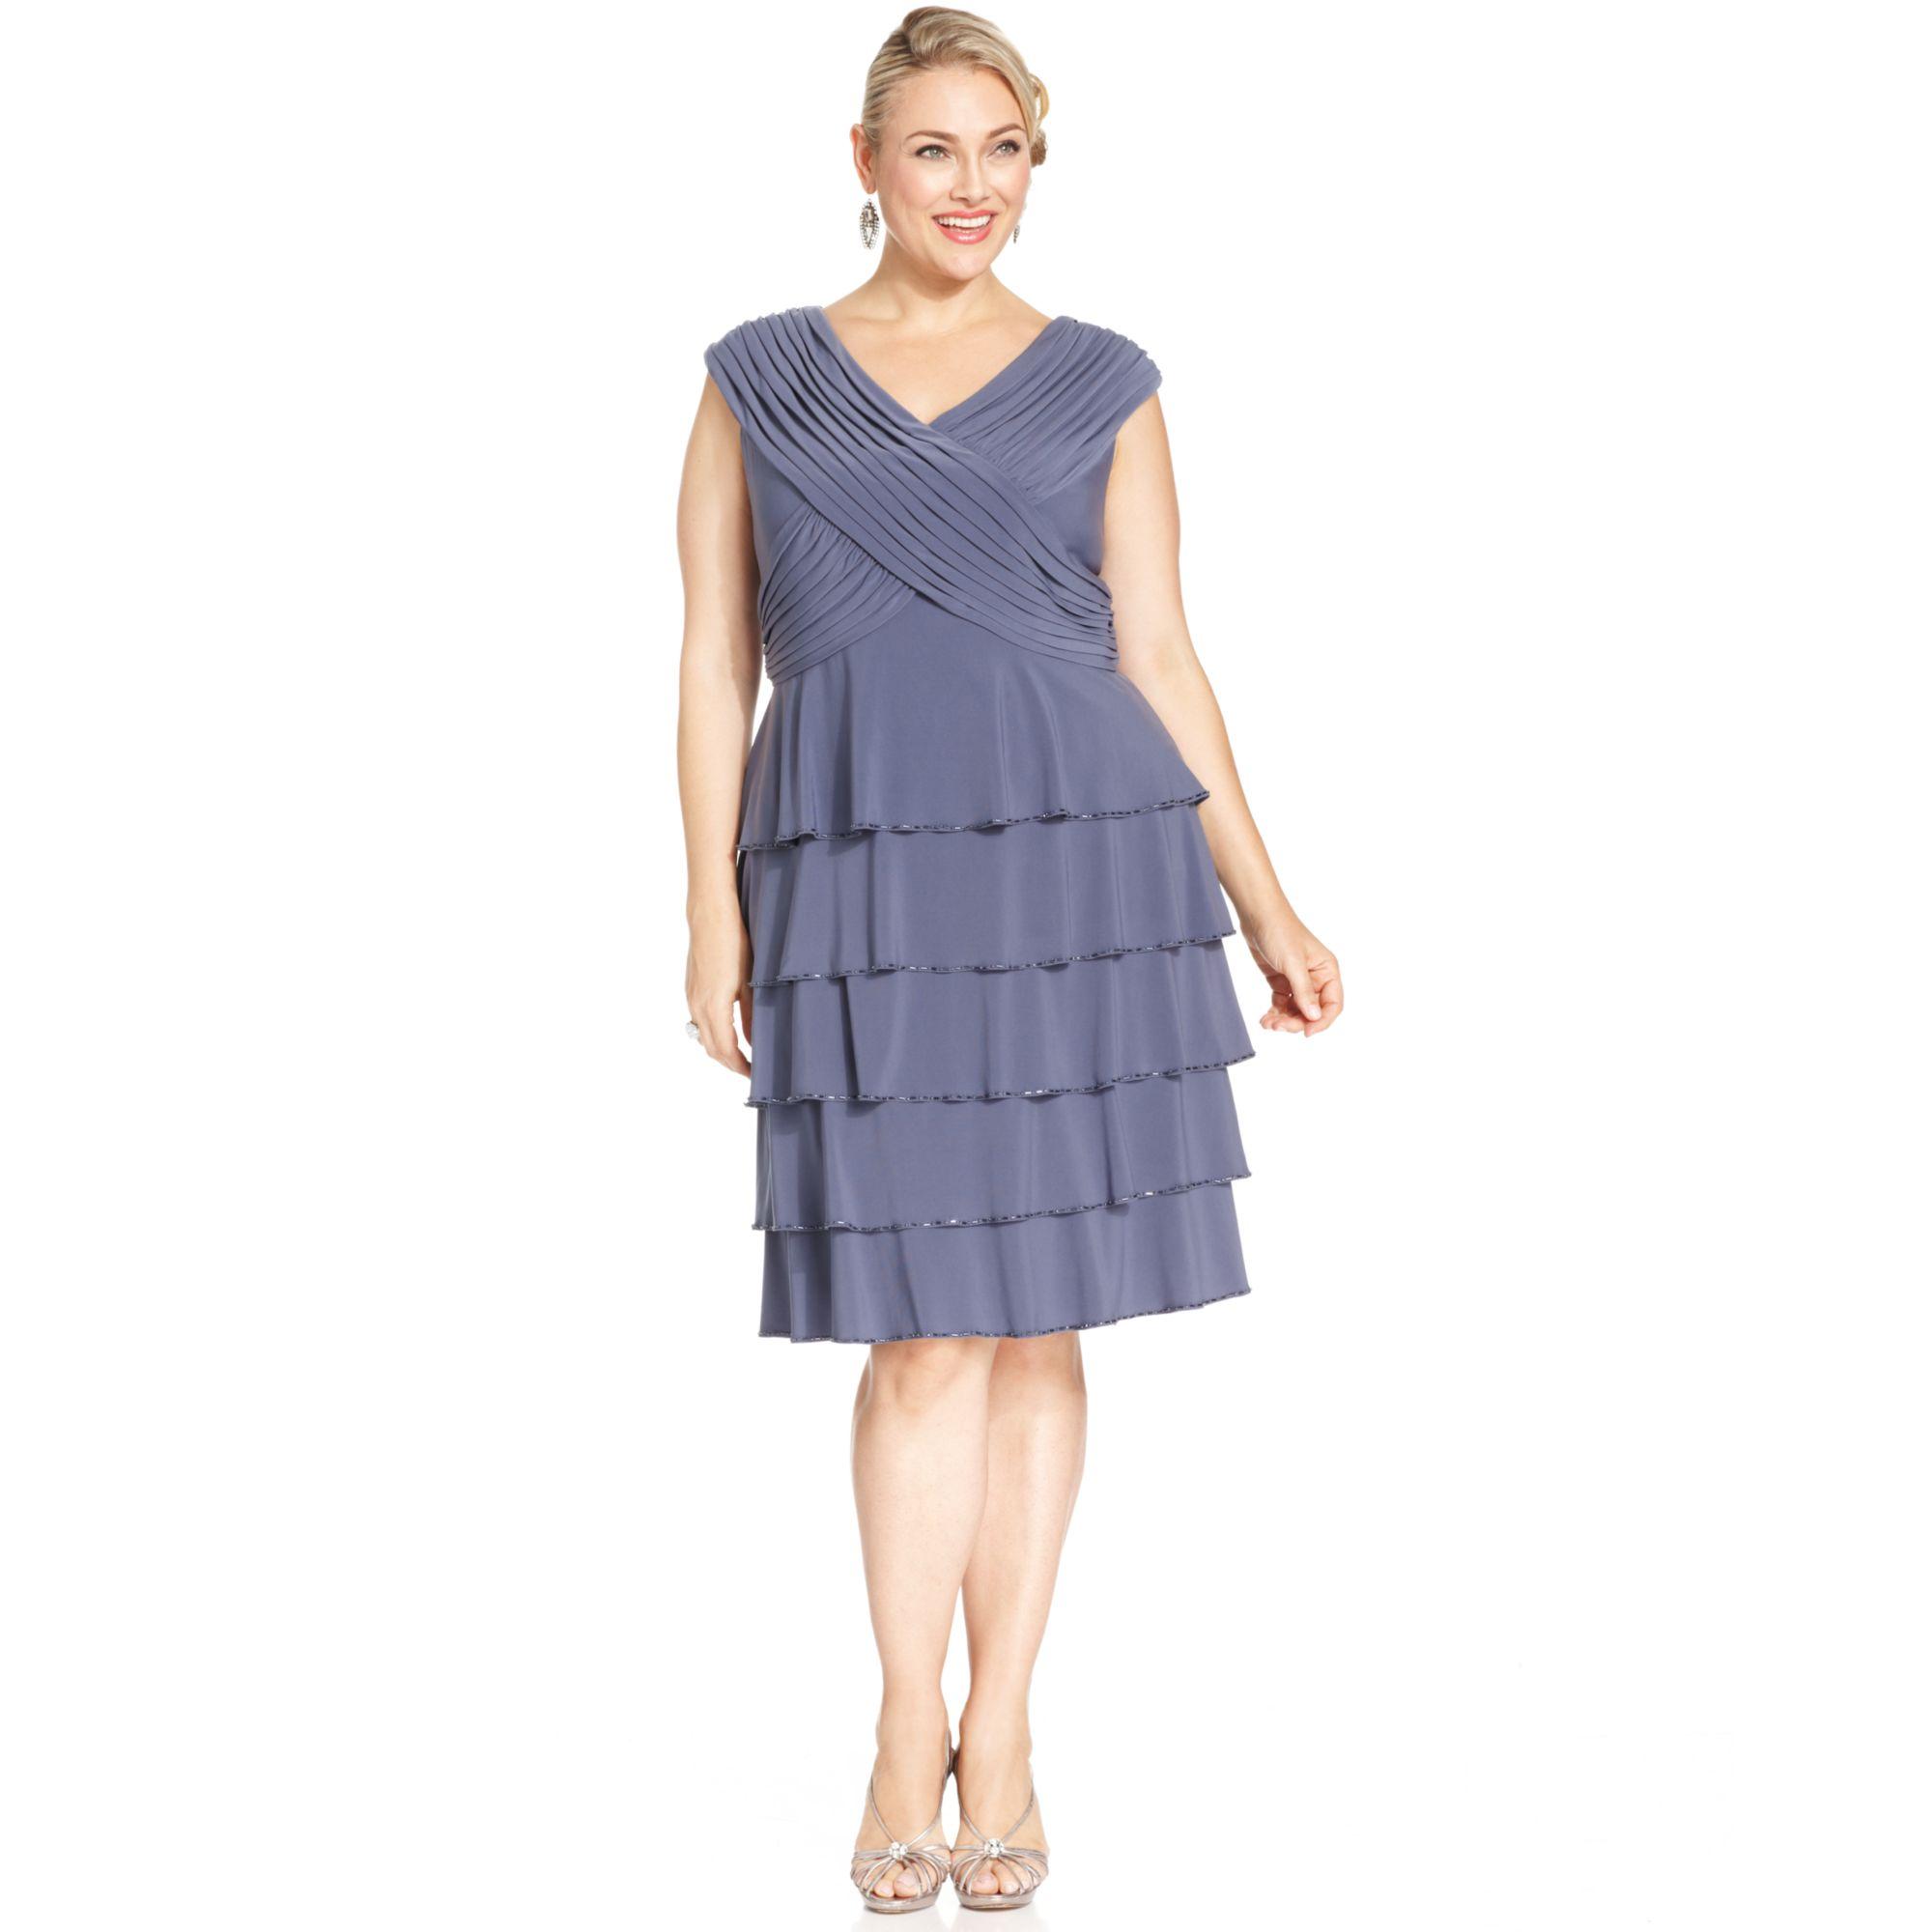 Patra Plus Size Beadtrim Tiered Dress in Blue - Lyst